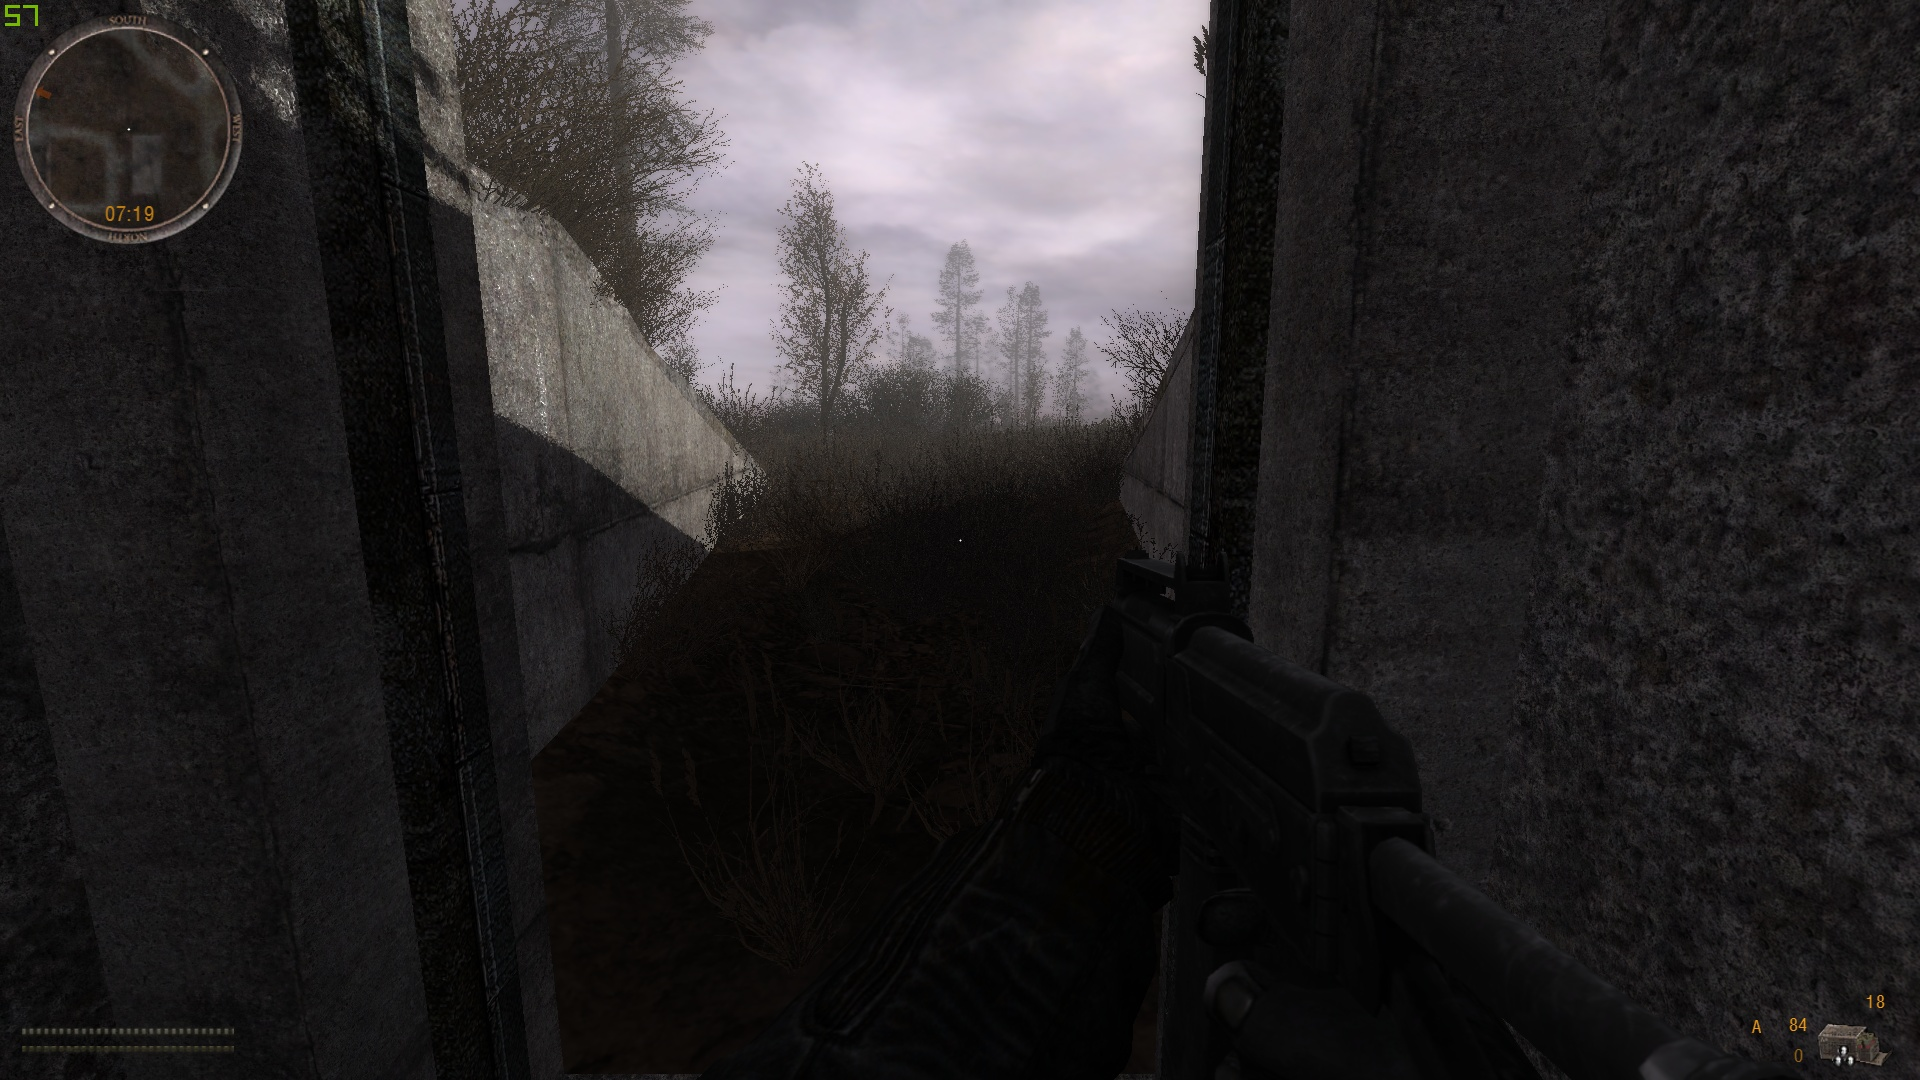 ss_Администратор_05-08-18_13-21-02_(jupiter).jpg - S.T.A.L.K.E.R.: Call of Pripyat